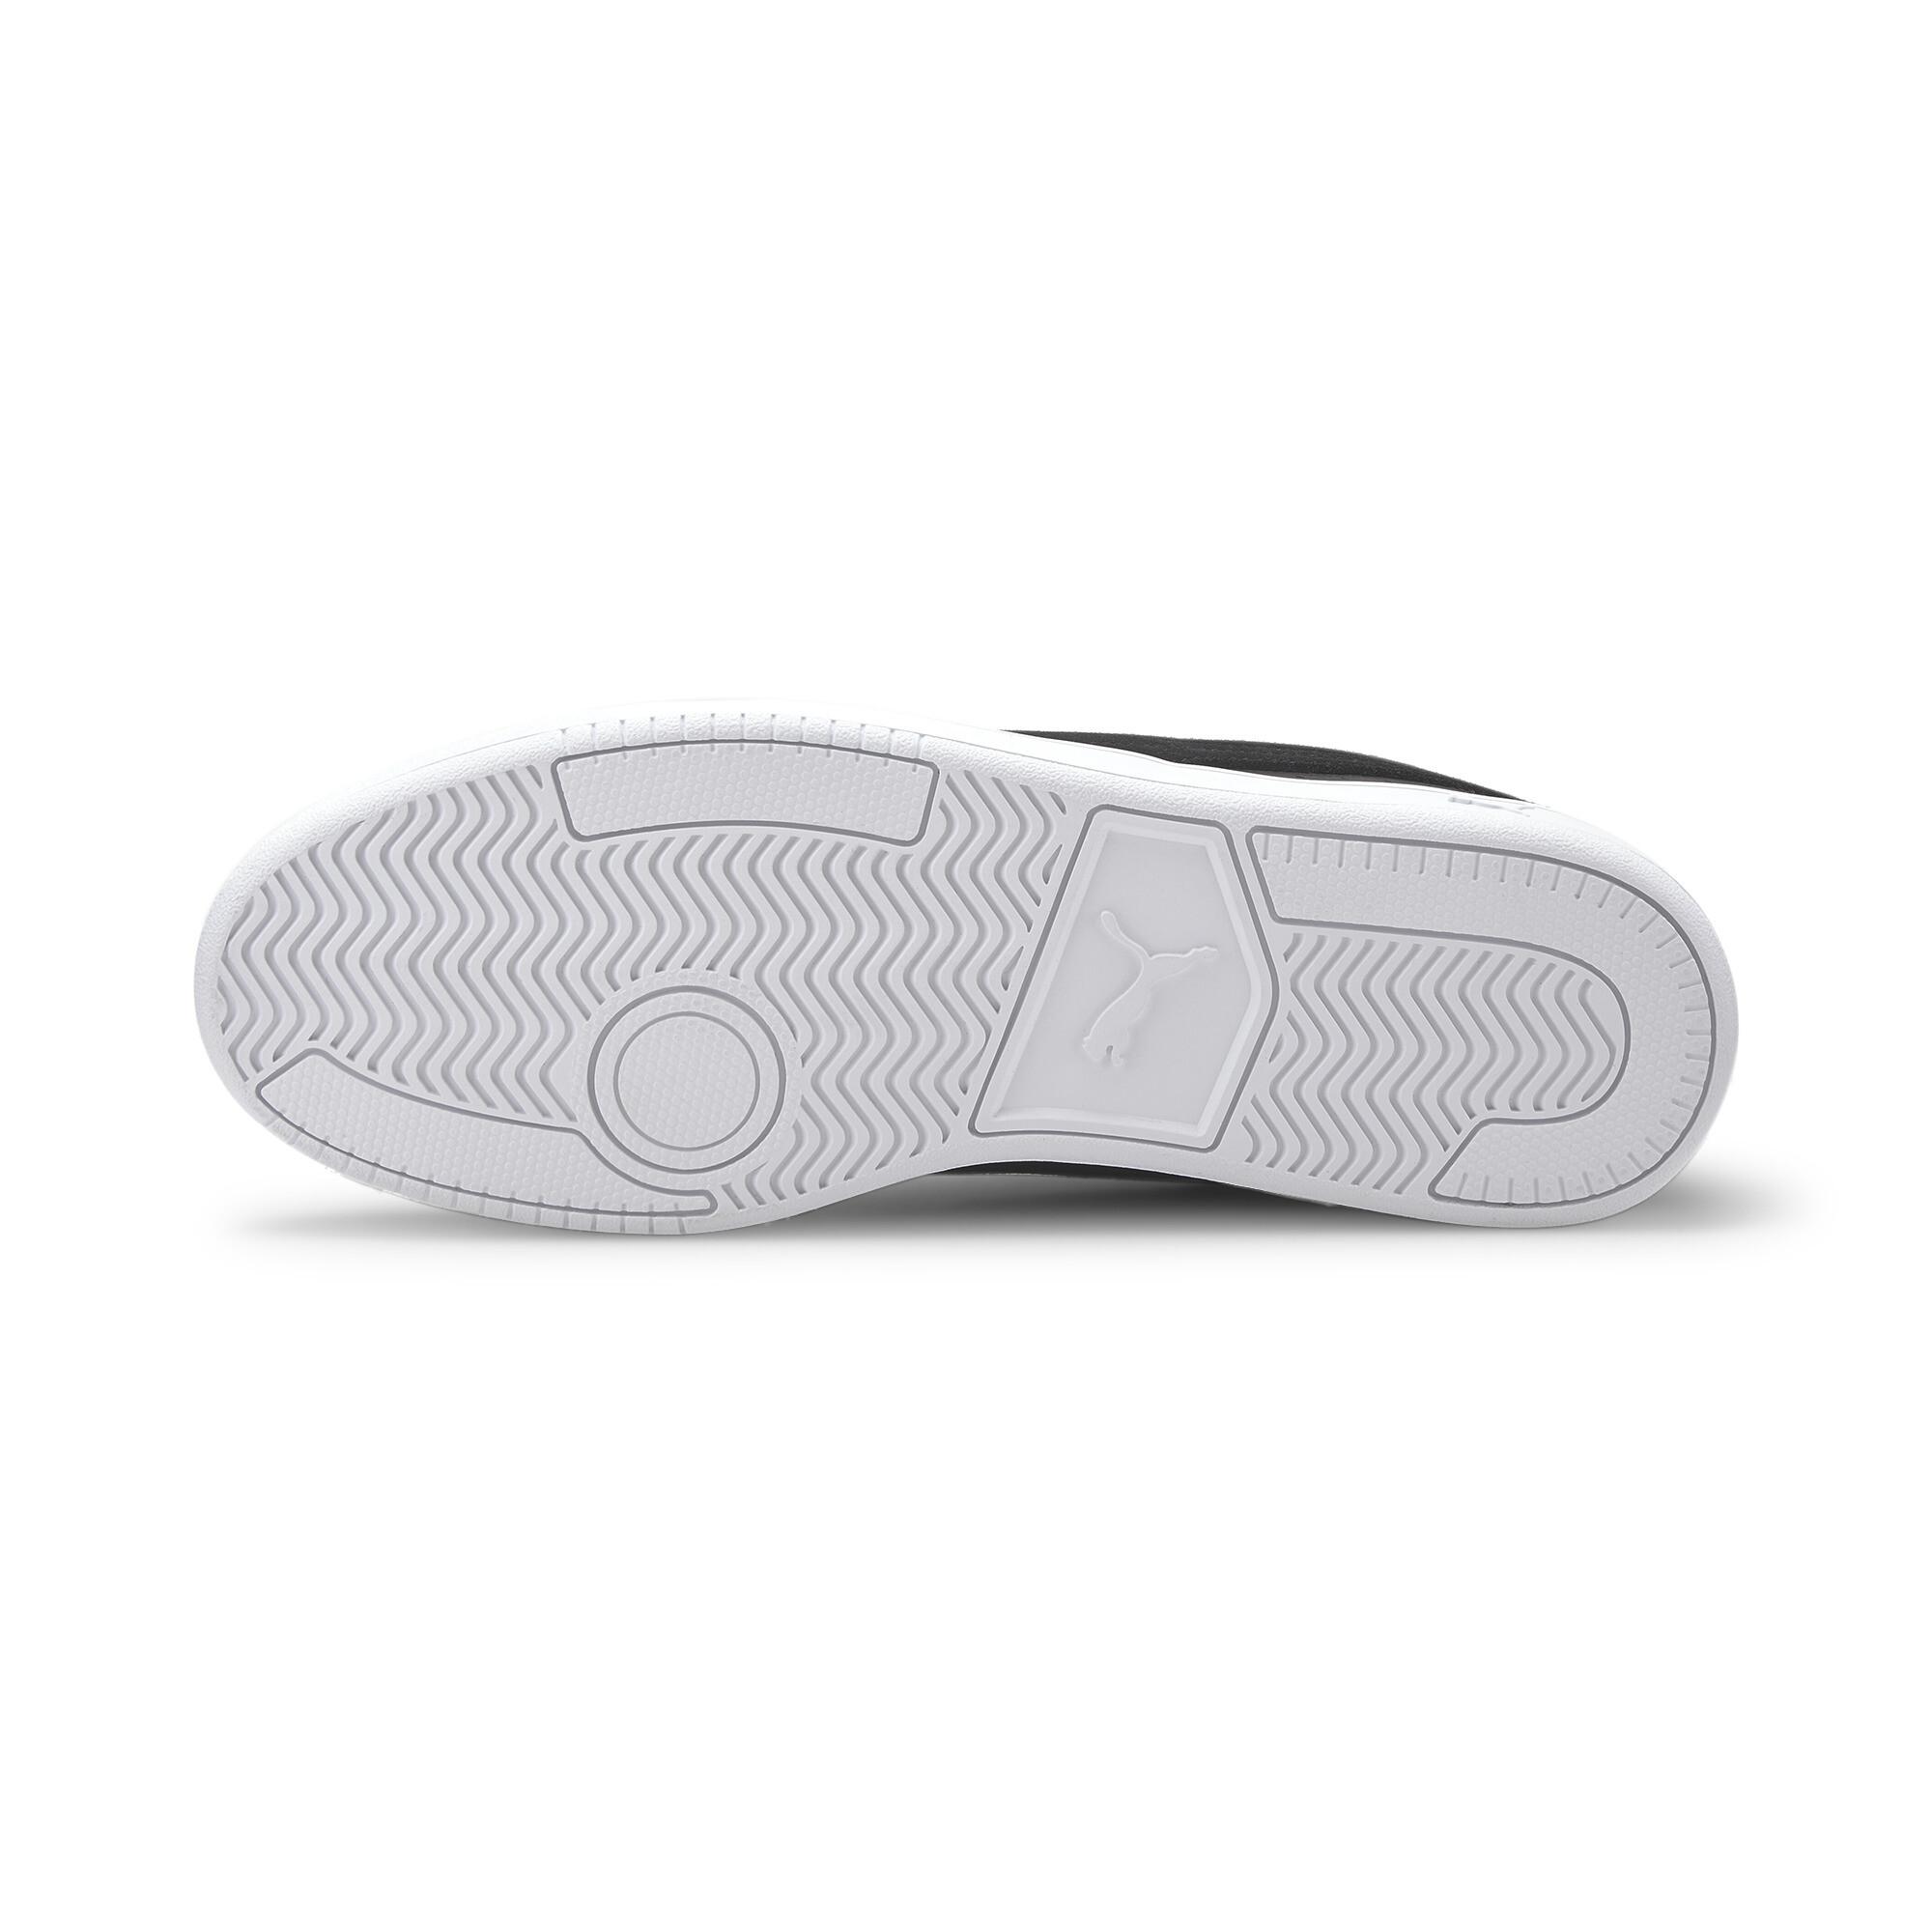 Indexbild 25 - PUMA Court Legend Lo Sneaker Unisex Schuhe Basics Neu